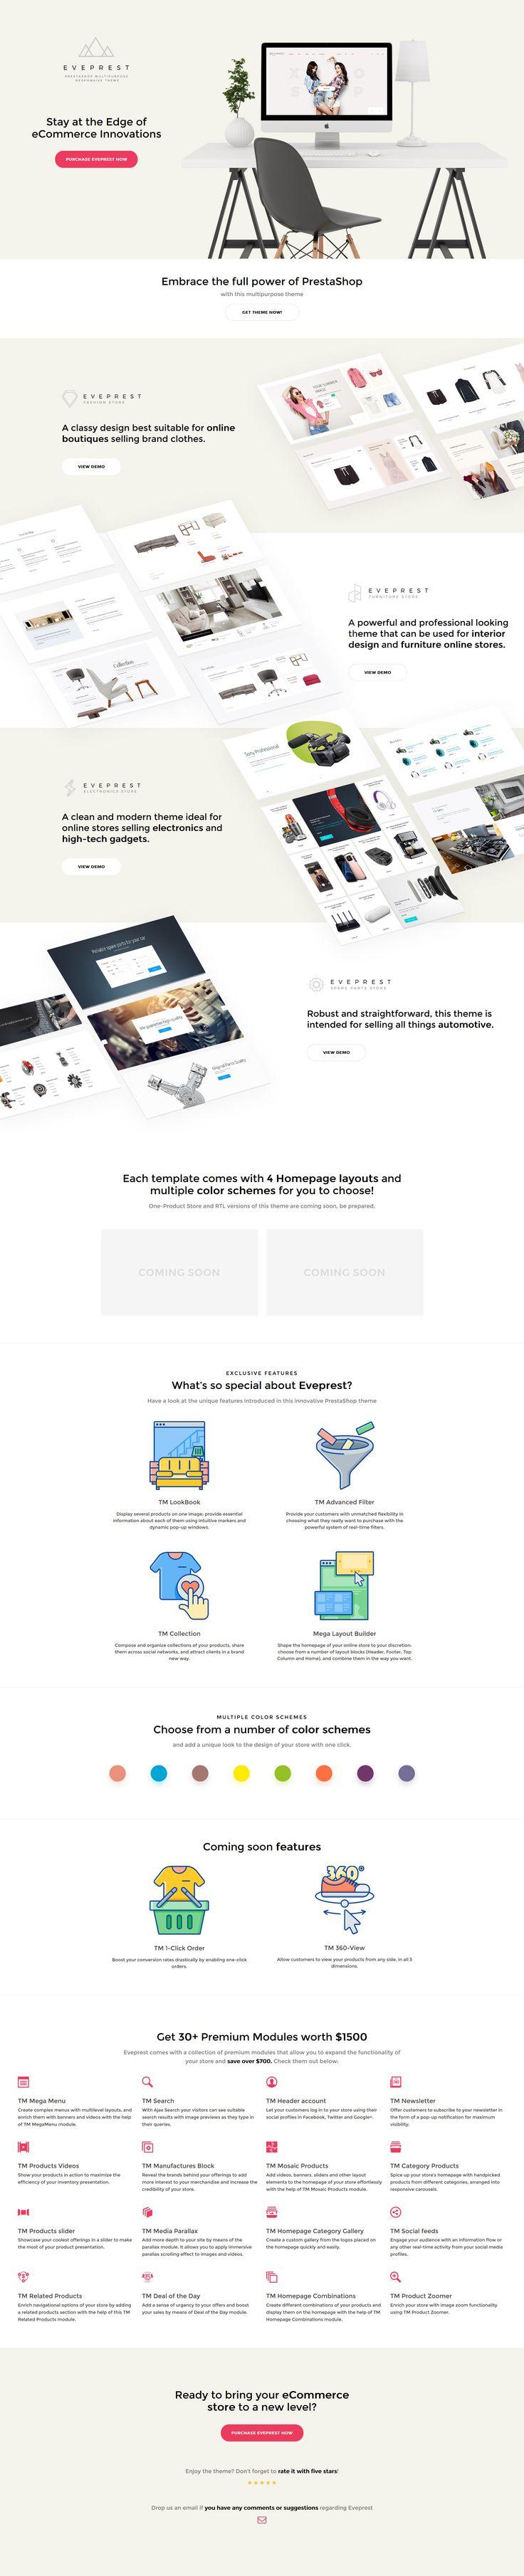 Eveprest - Multipurpose PrestaShop Theme - http://www.templatemonster.com/prestashop-themes/eveprest.html